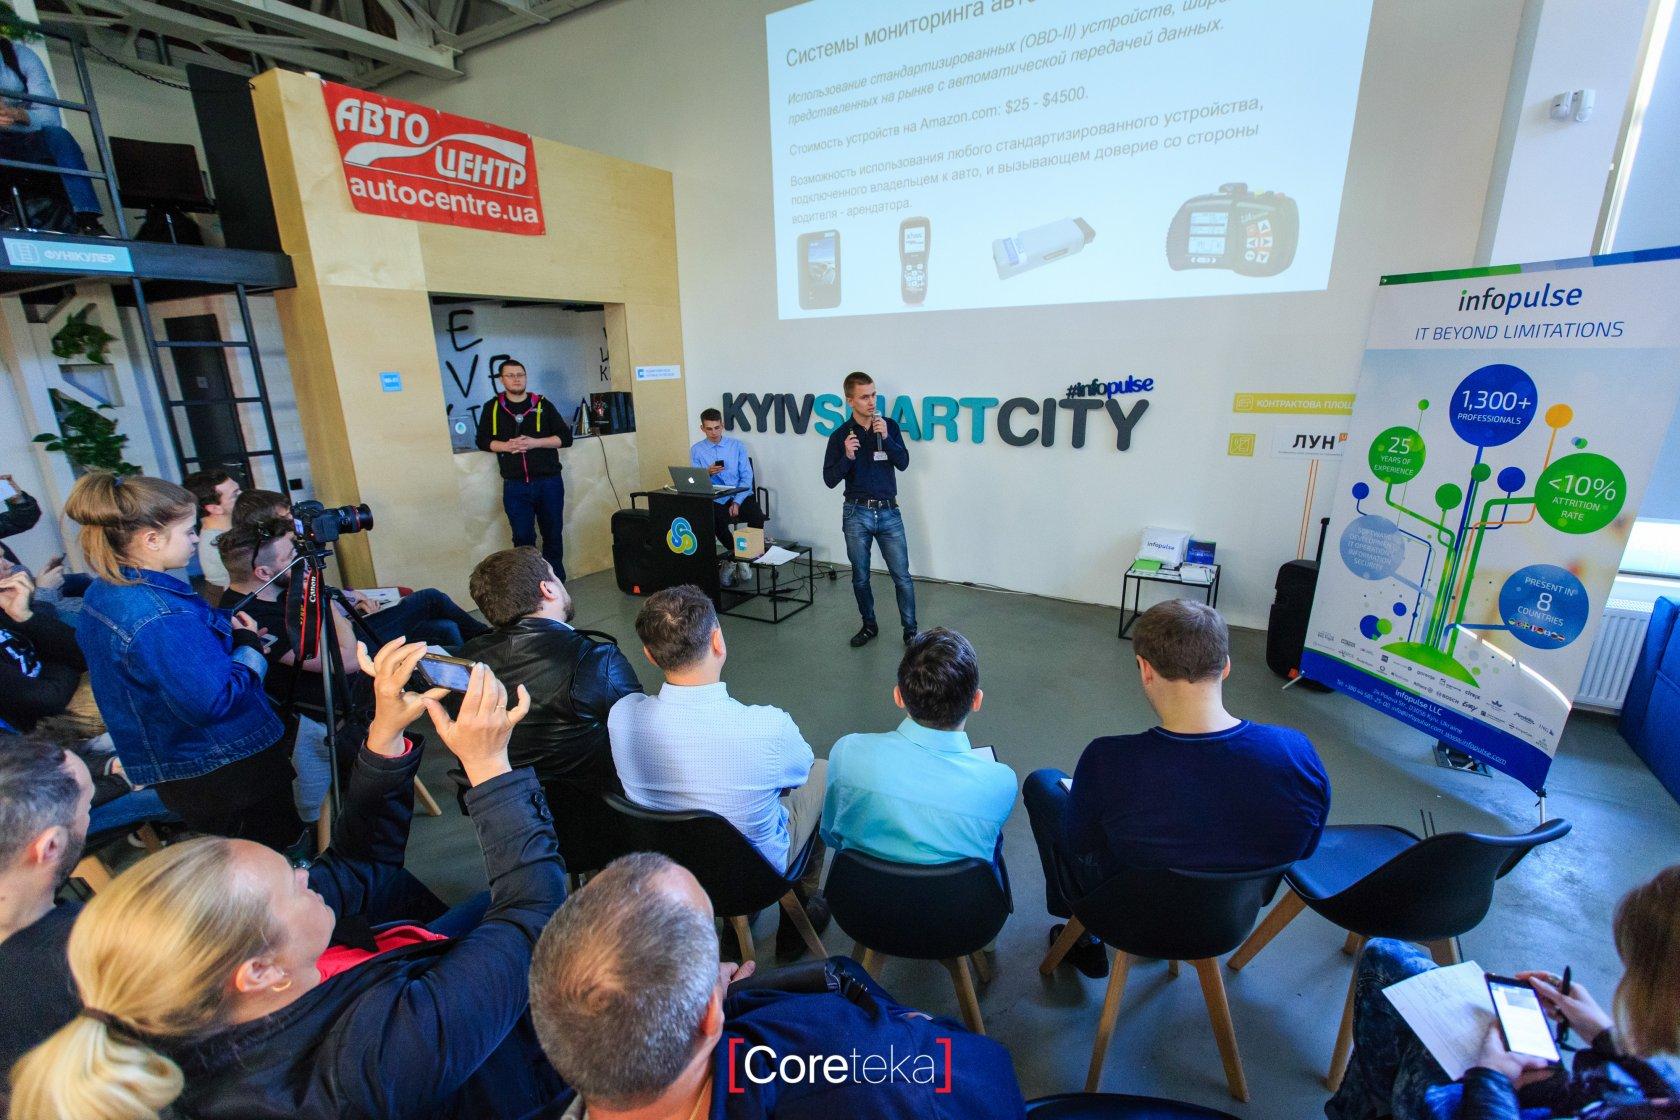 CoreTeka Automotive Hackathon #1 - Coreteka